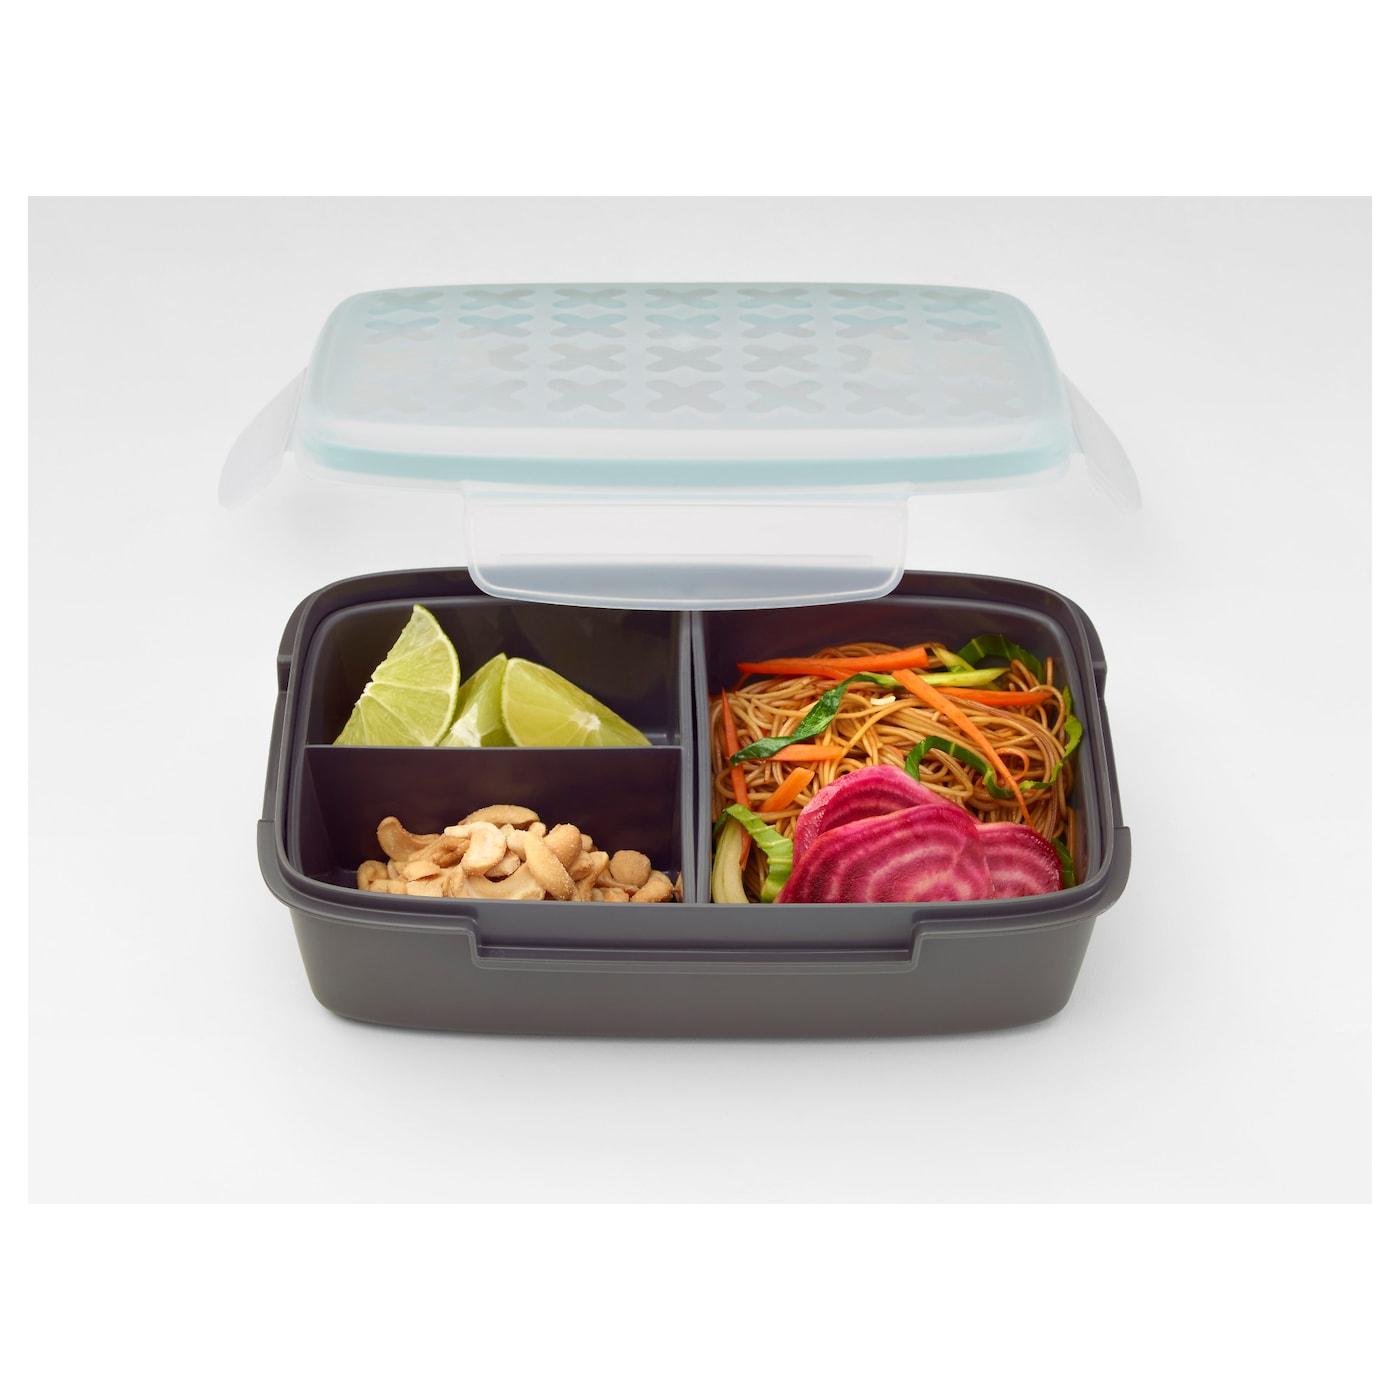 FESTMÅLTID Lunch Box Grey 22x14x7 Cm